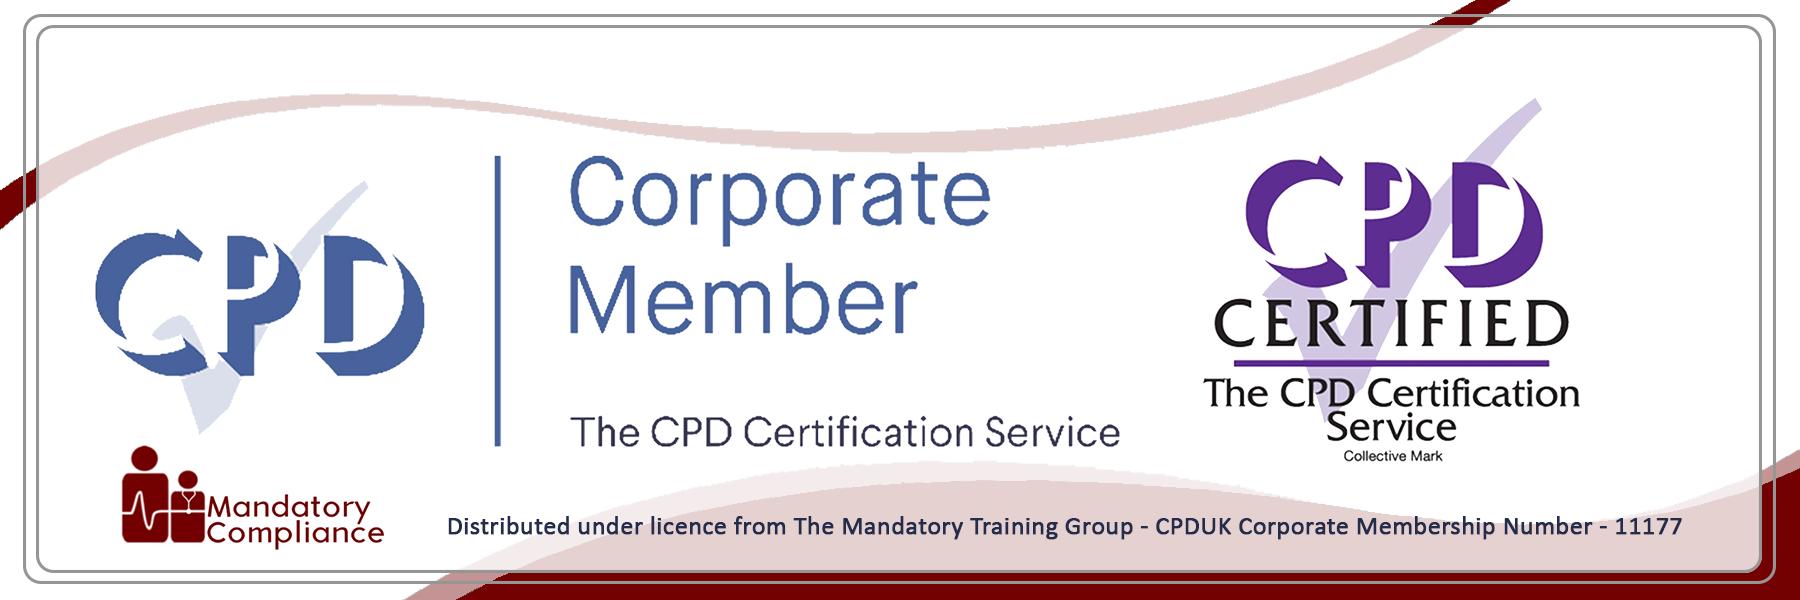 DSE Risk Assessment - Online Training Courses - Mandatory Compliance UK -